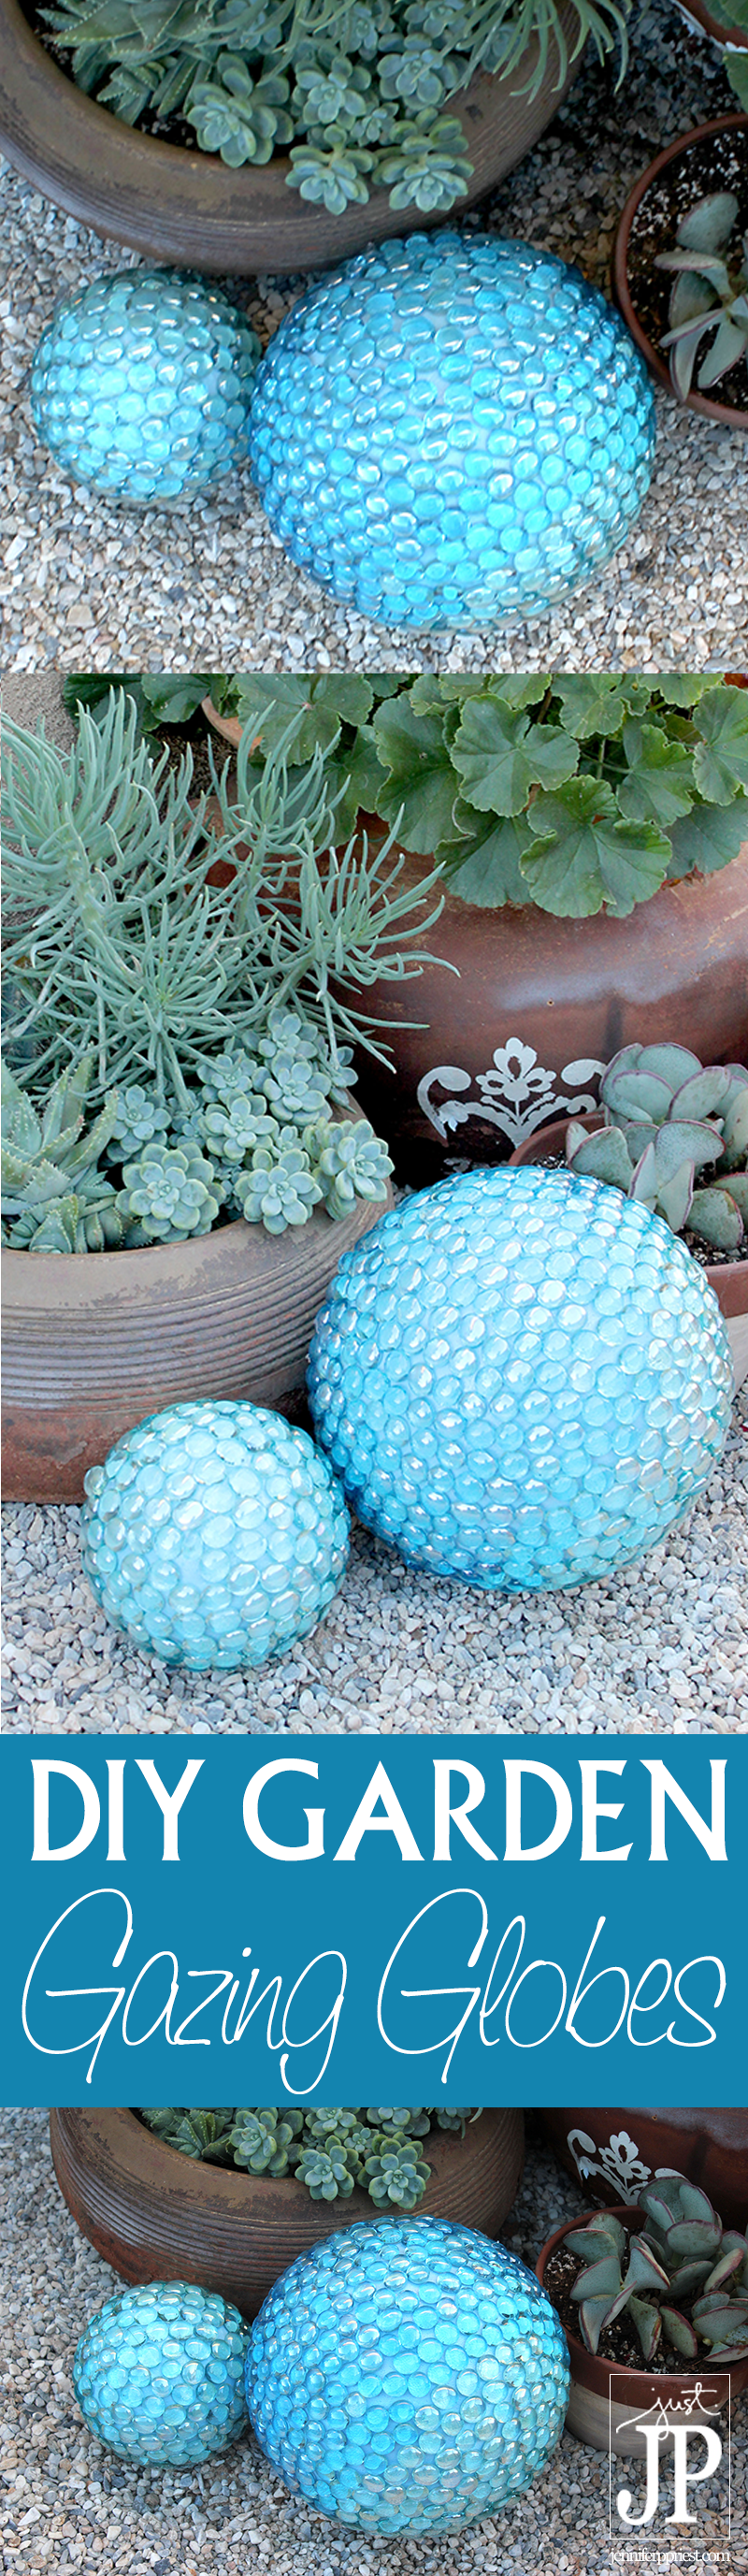 Luxus Gartendeko Diy Design